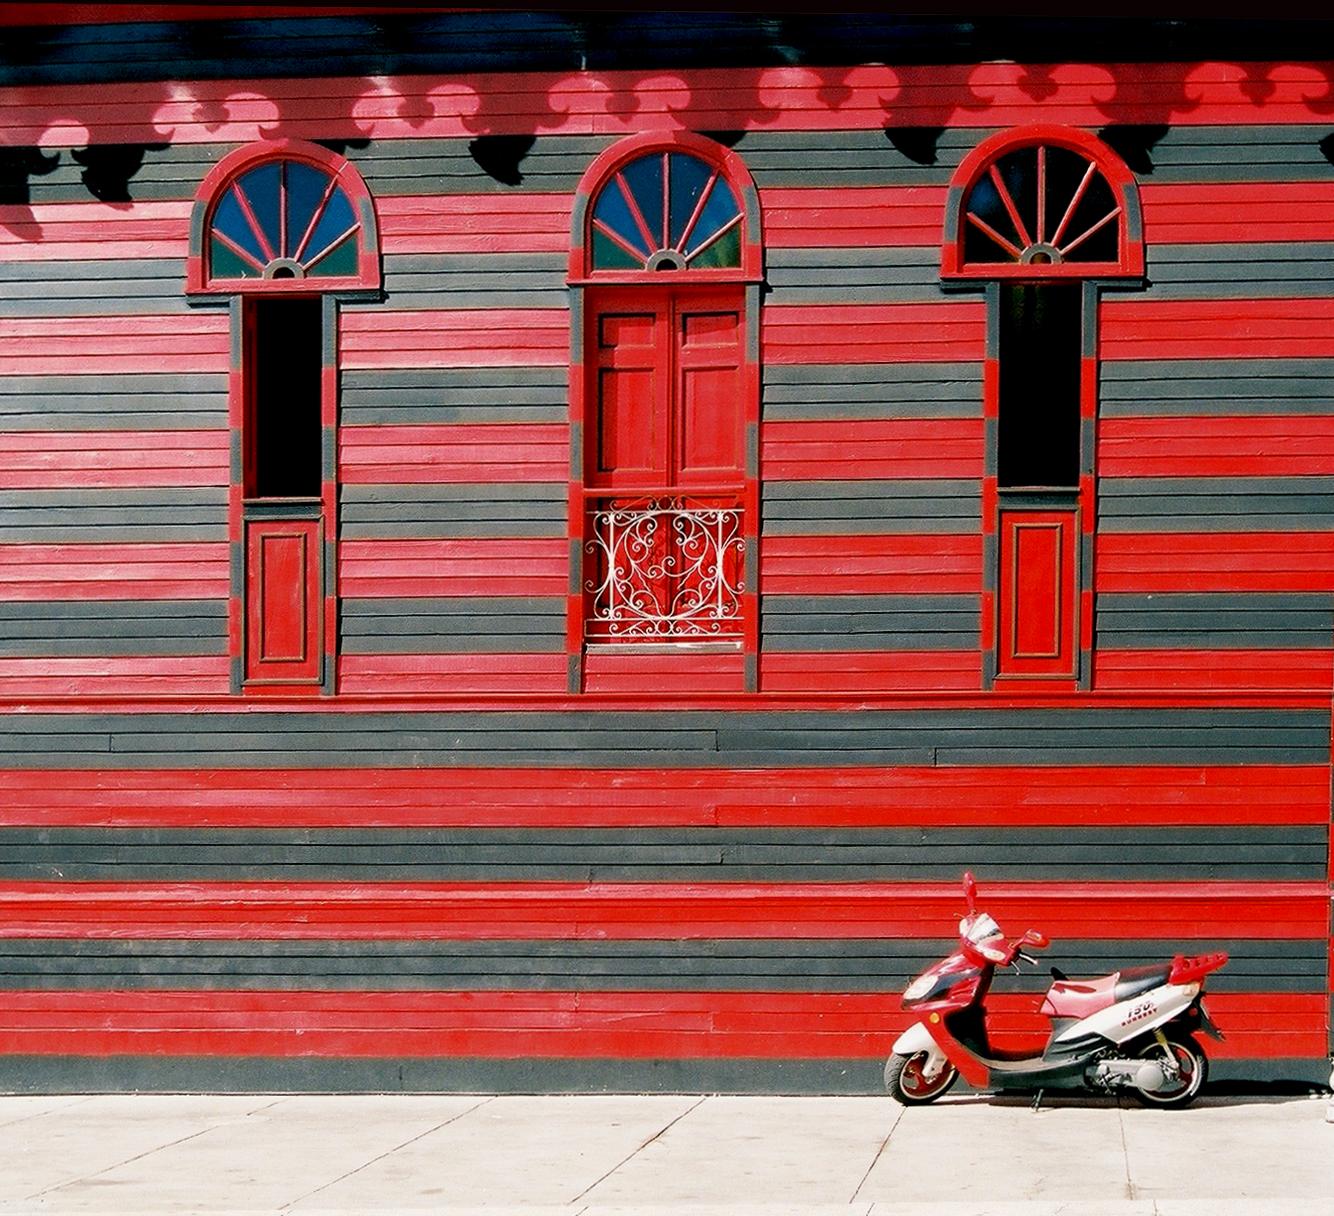 The red house, Bike, Carribean, Firehouse, House, HQ Photo